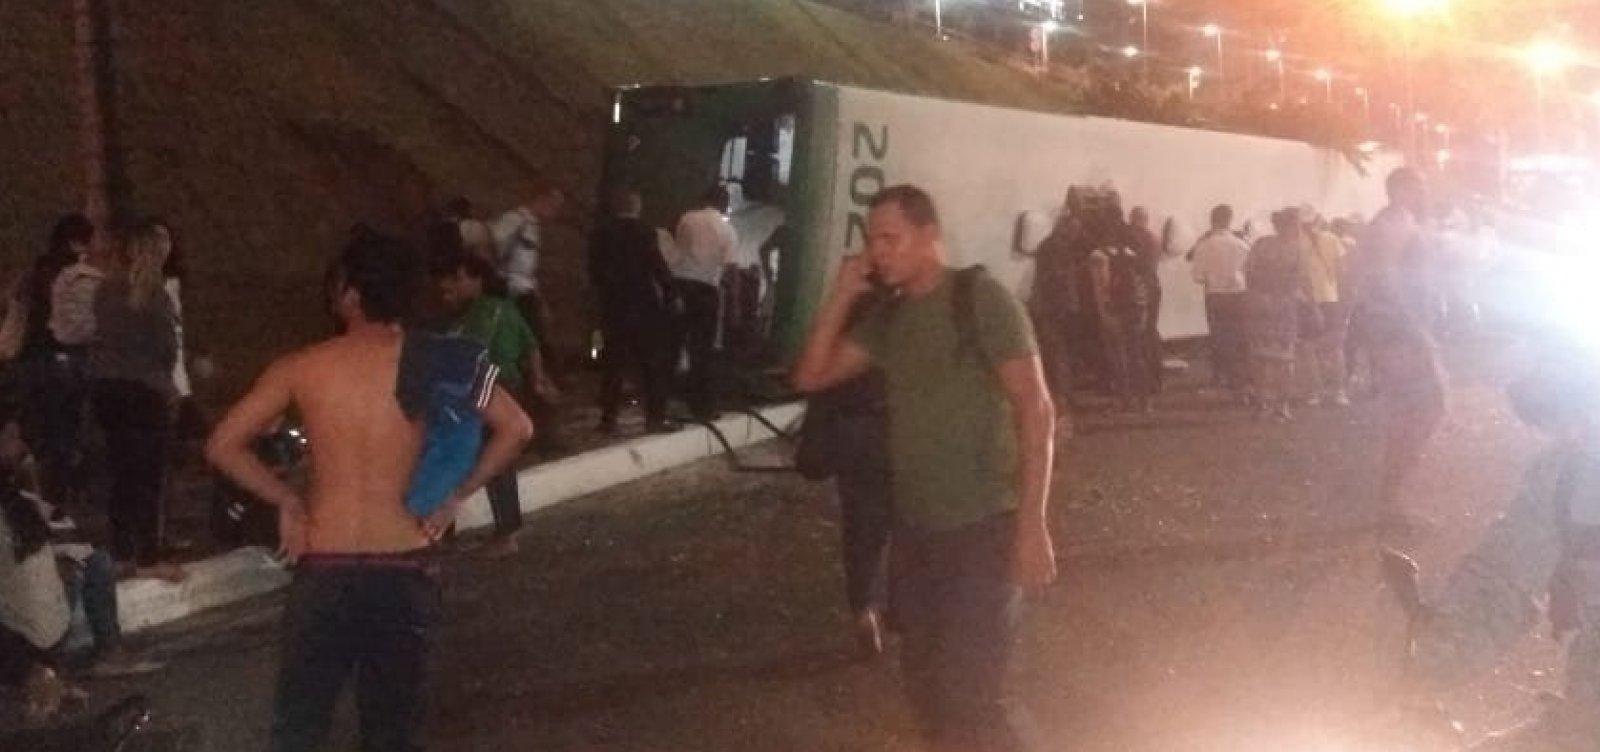 [Vídeo mostra resgate de vítimas de ônibus que caiu de viaduto; veja]